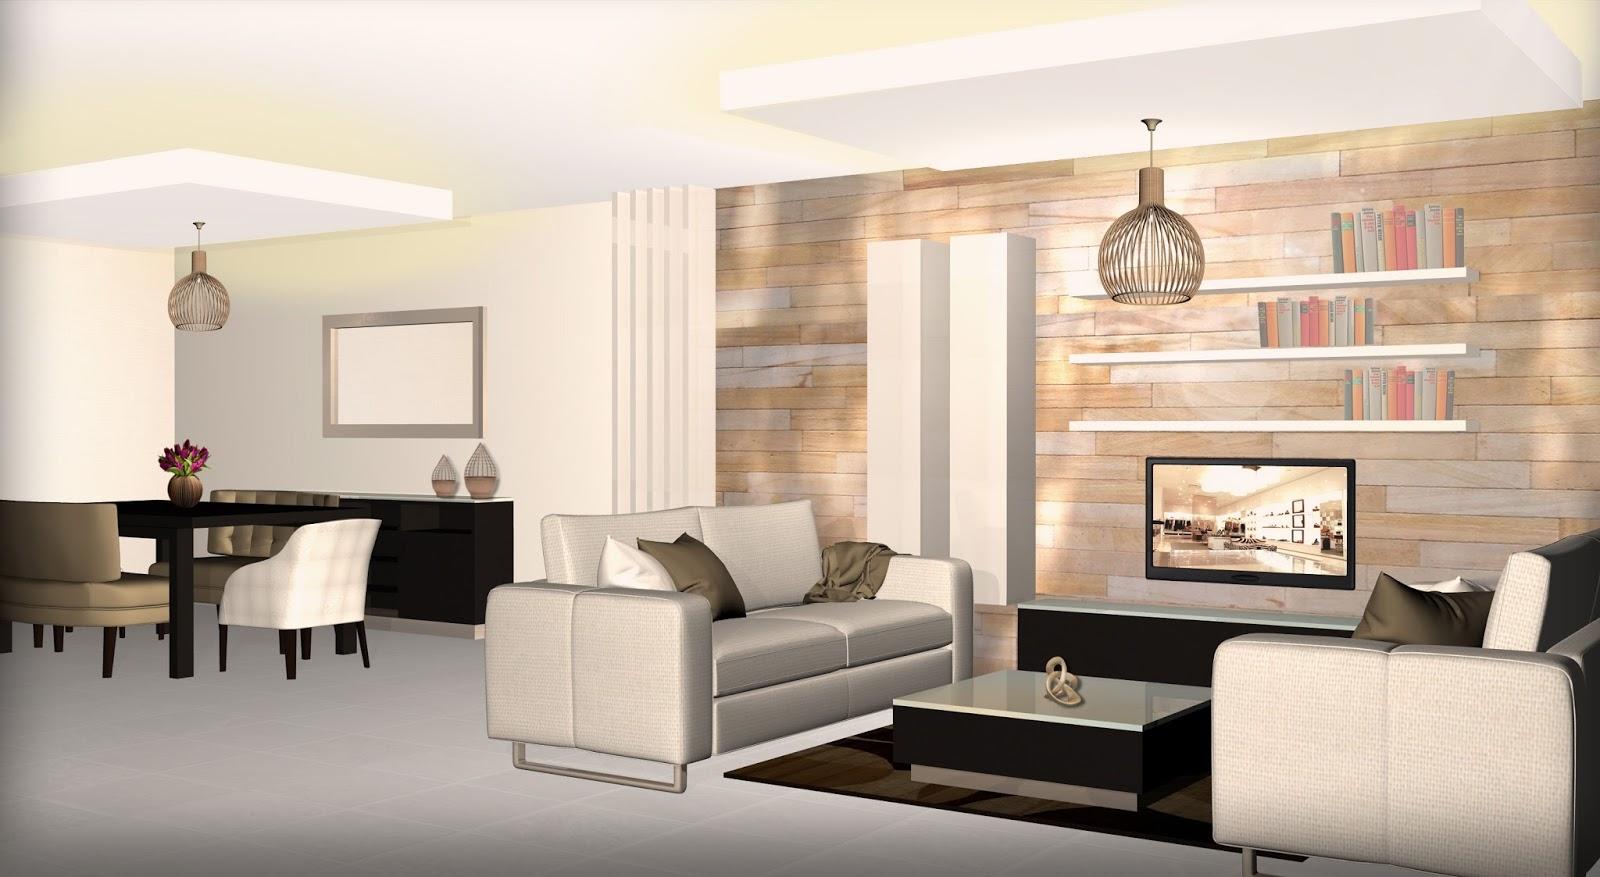 Proyectos de dise o decoraci n de interiores dise o y for Cortinas departamentos pequenos